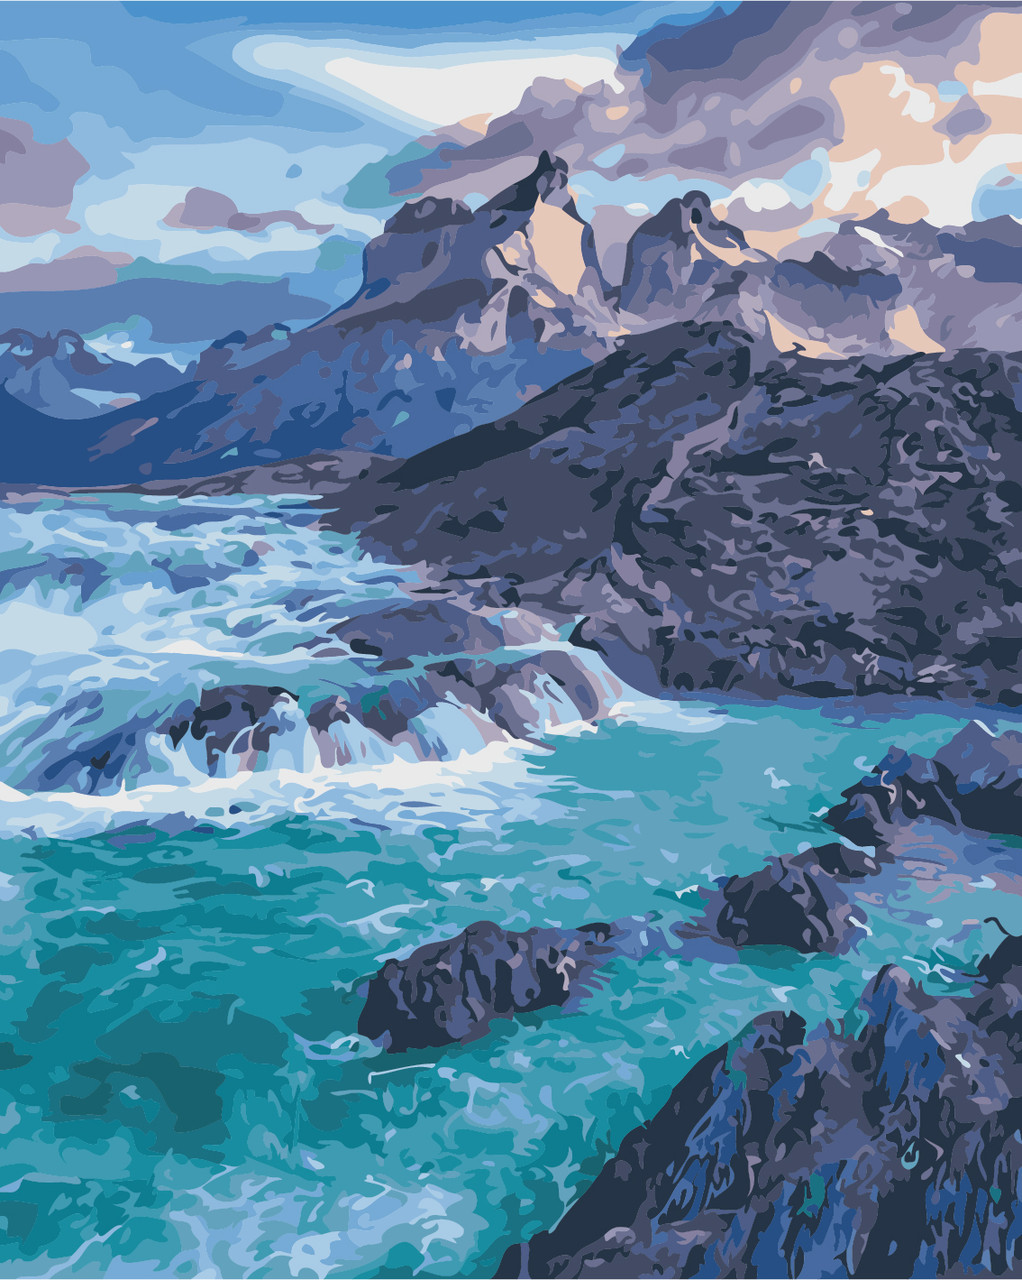 Картина по номерам Прибрежные скалы 40 х 50 см (AS0375)